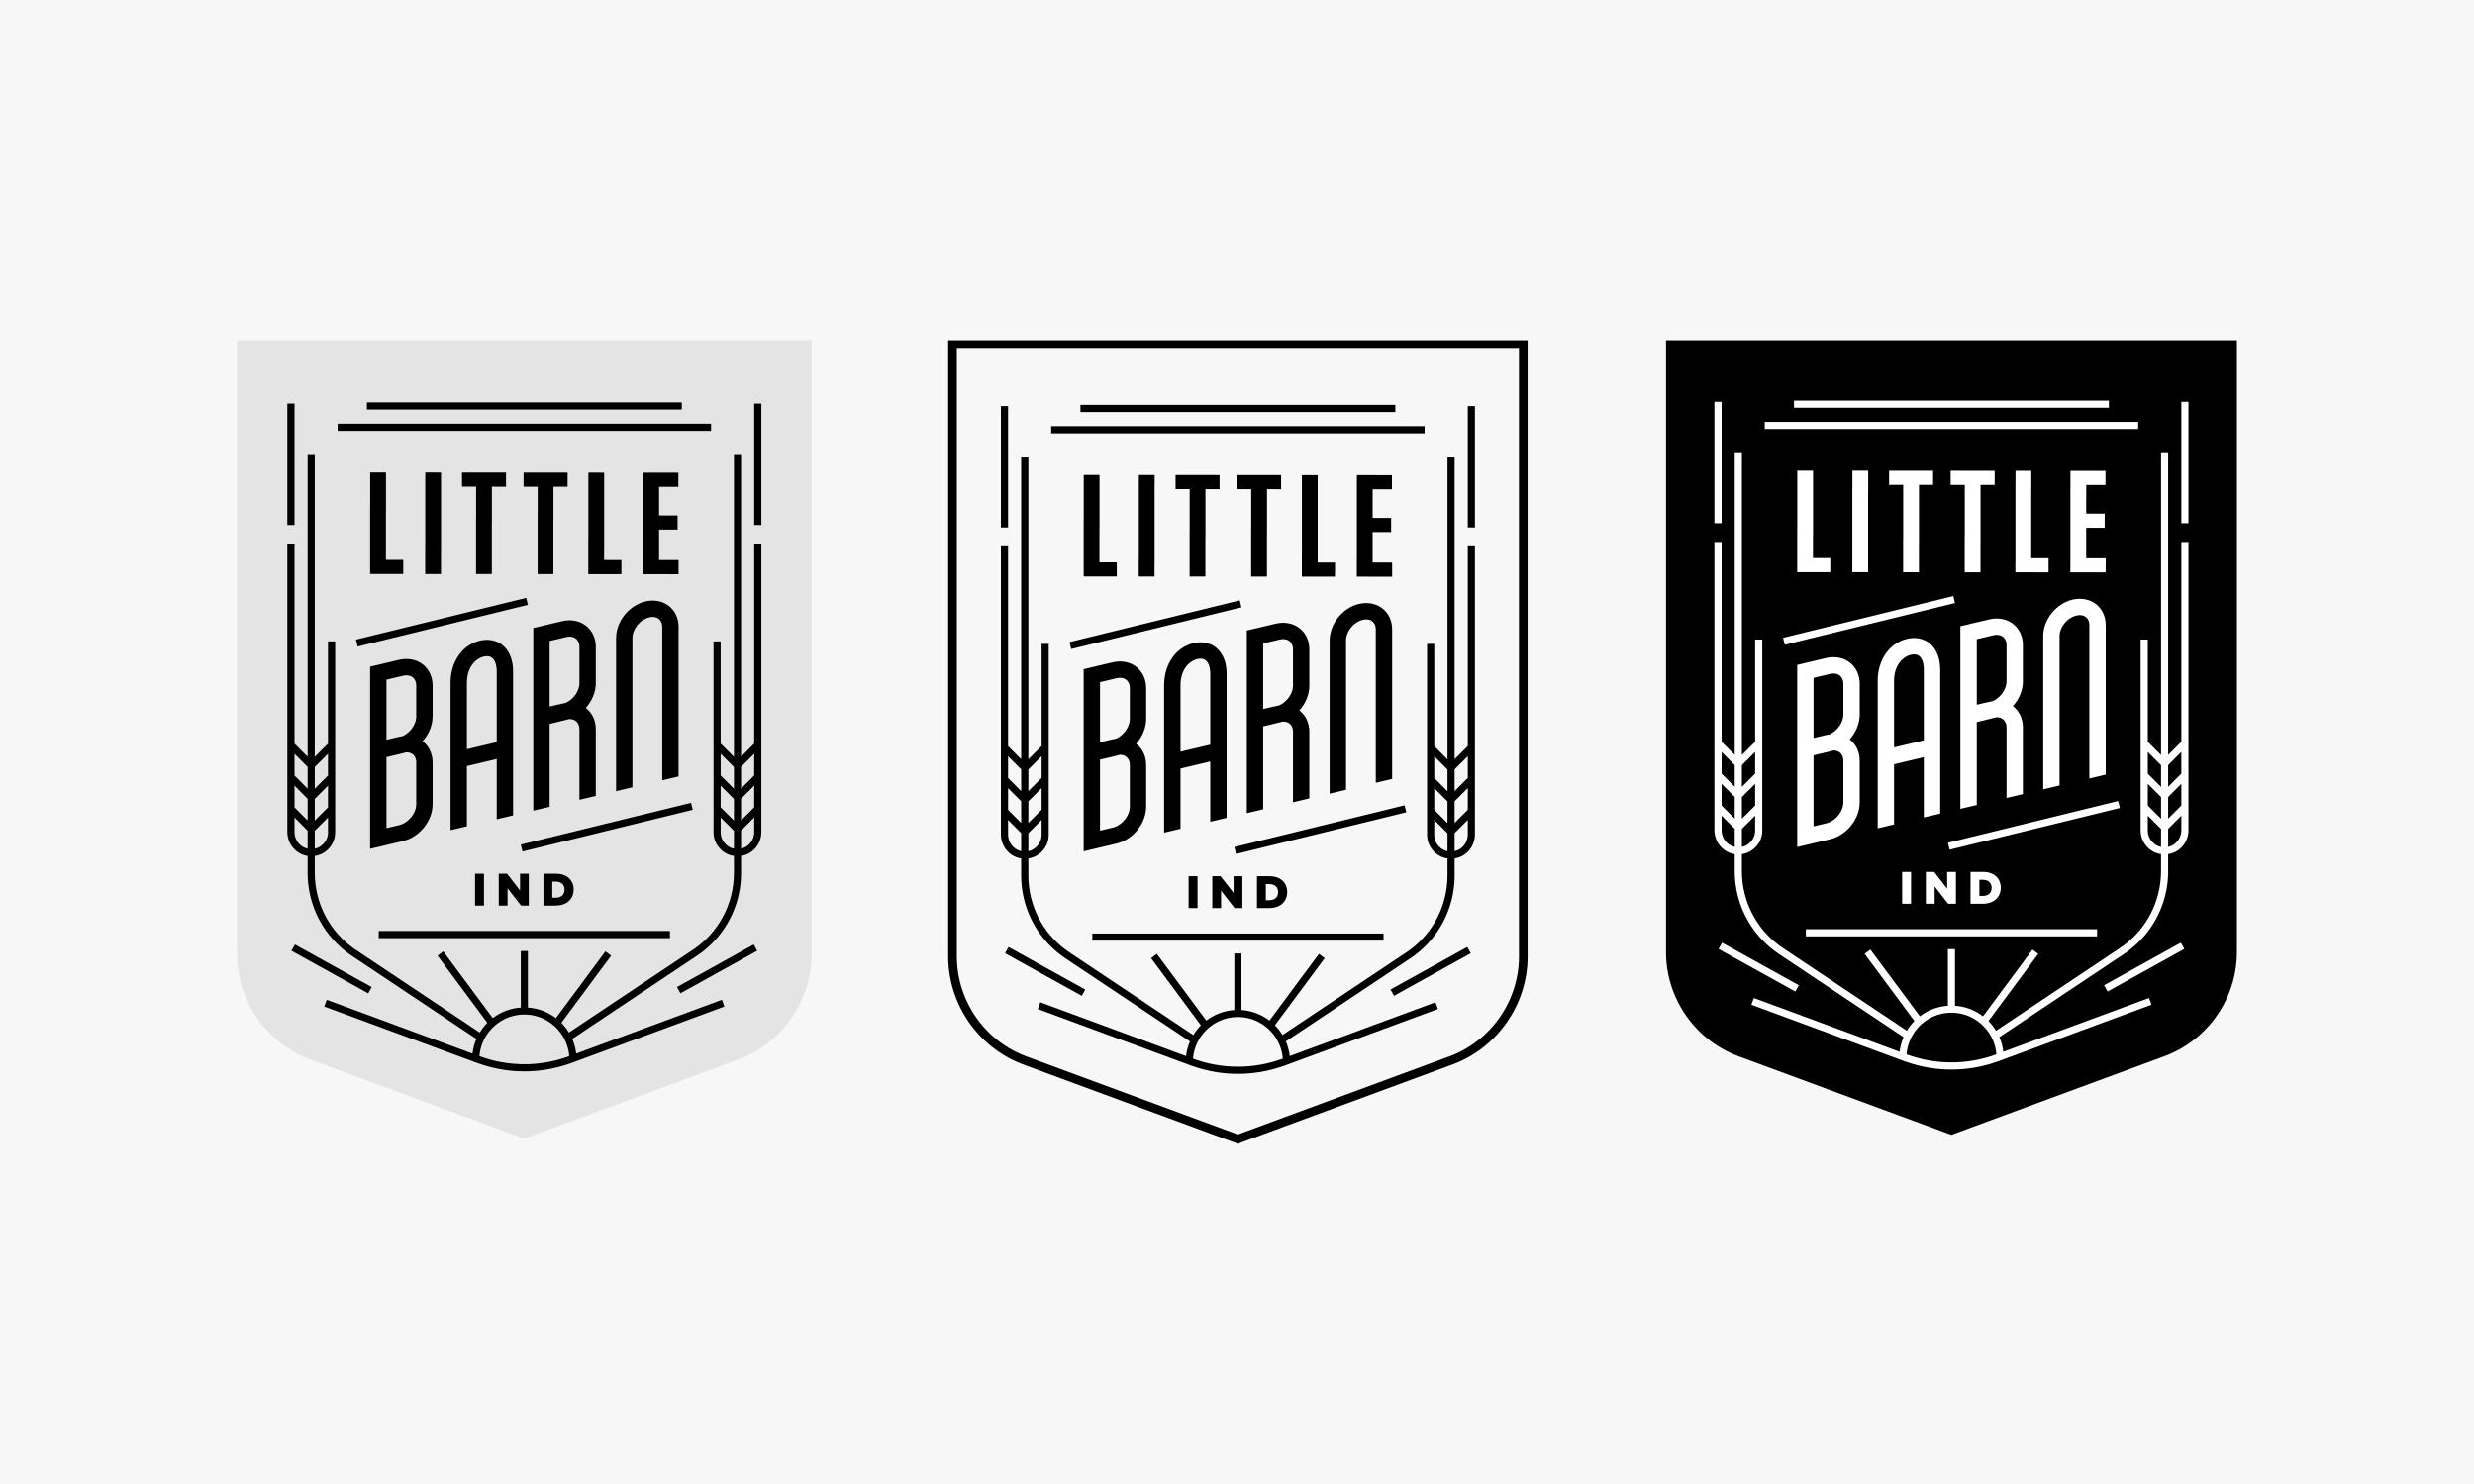 Little_Barn_logos.png